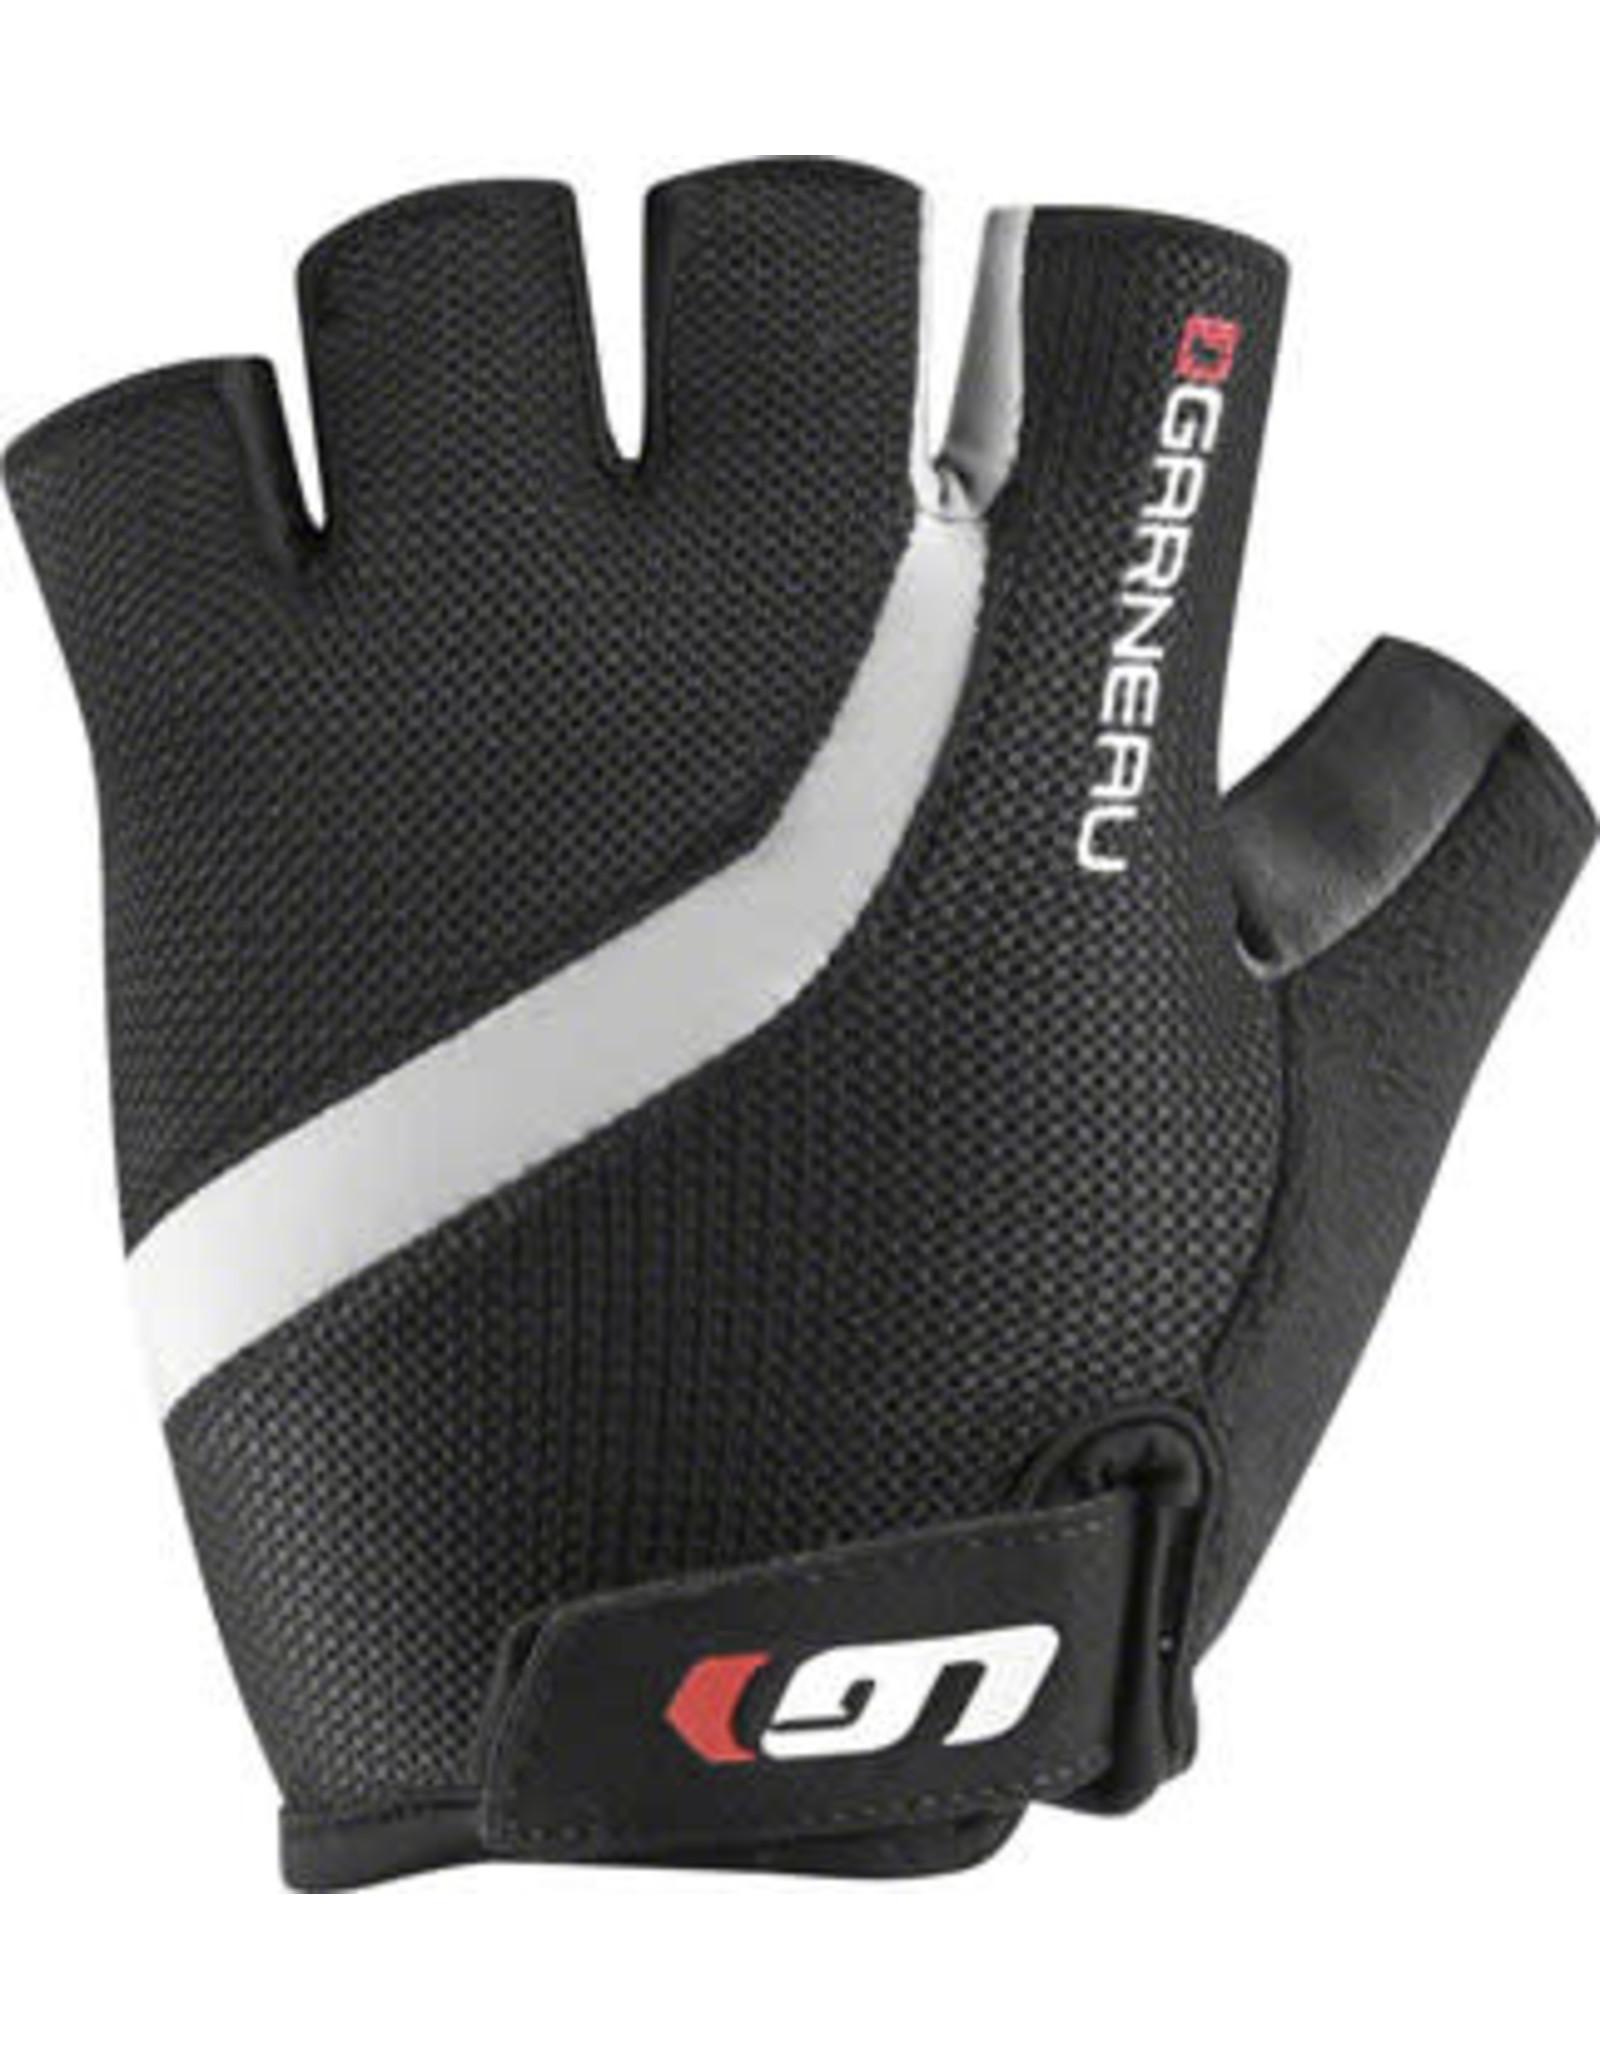 Garneau Biogel RX-V Men's Glove: Black XL